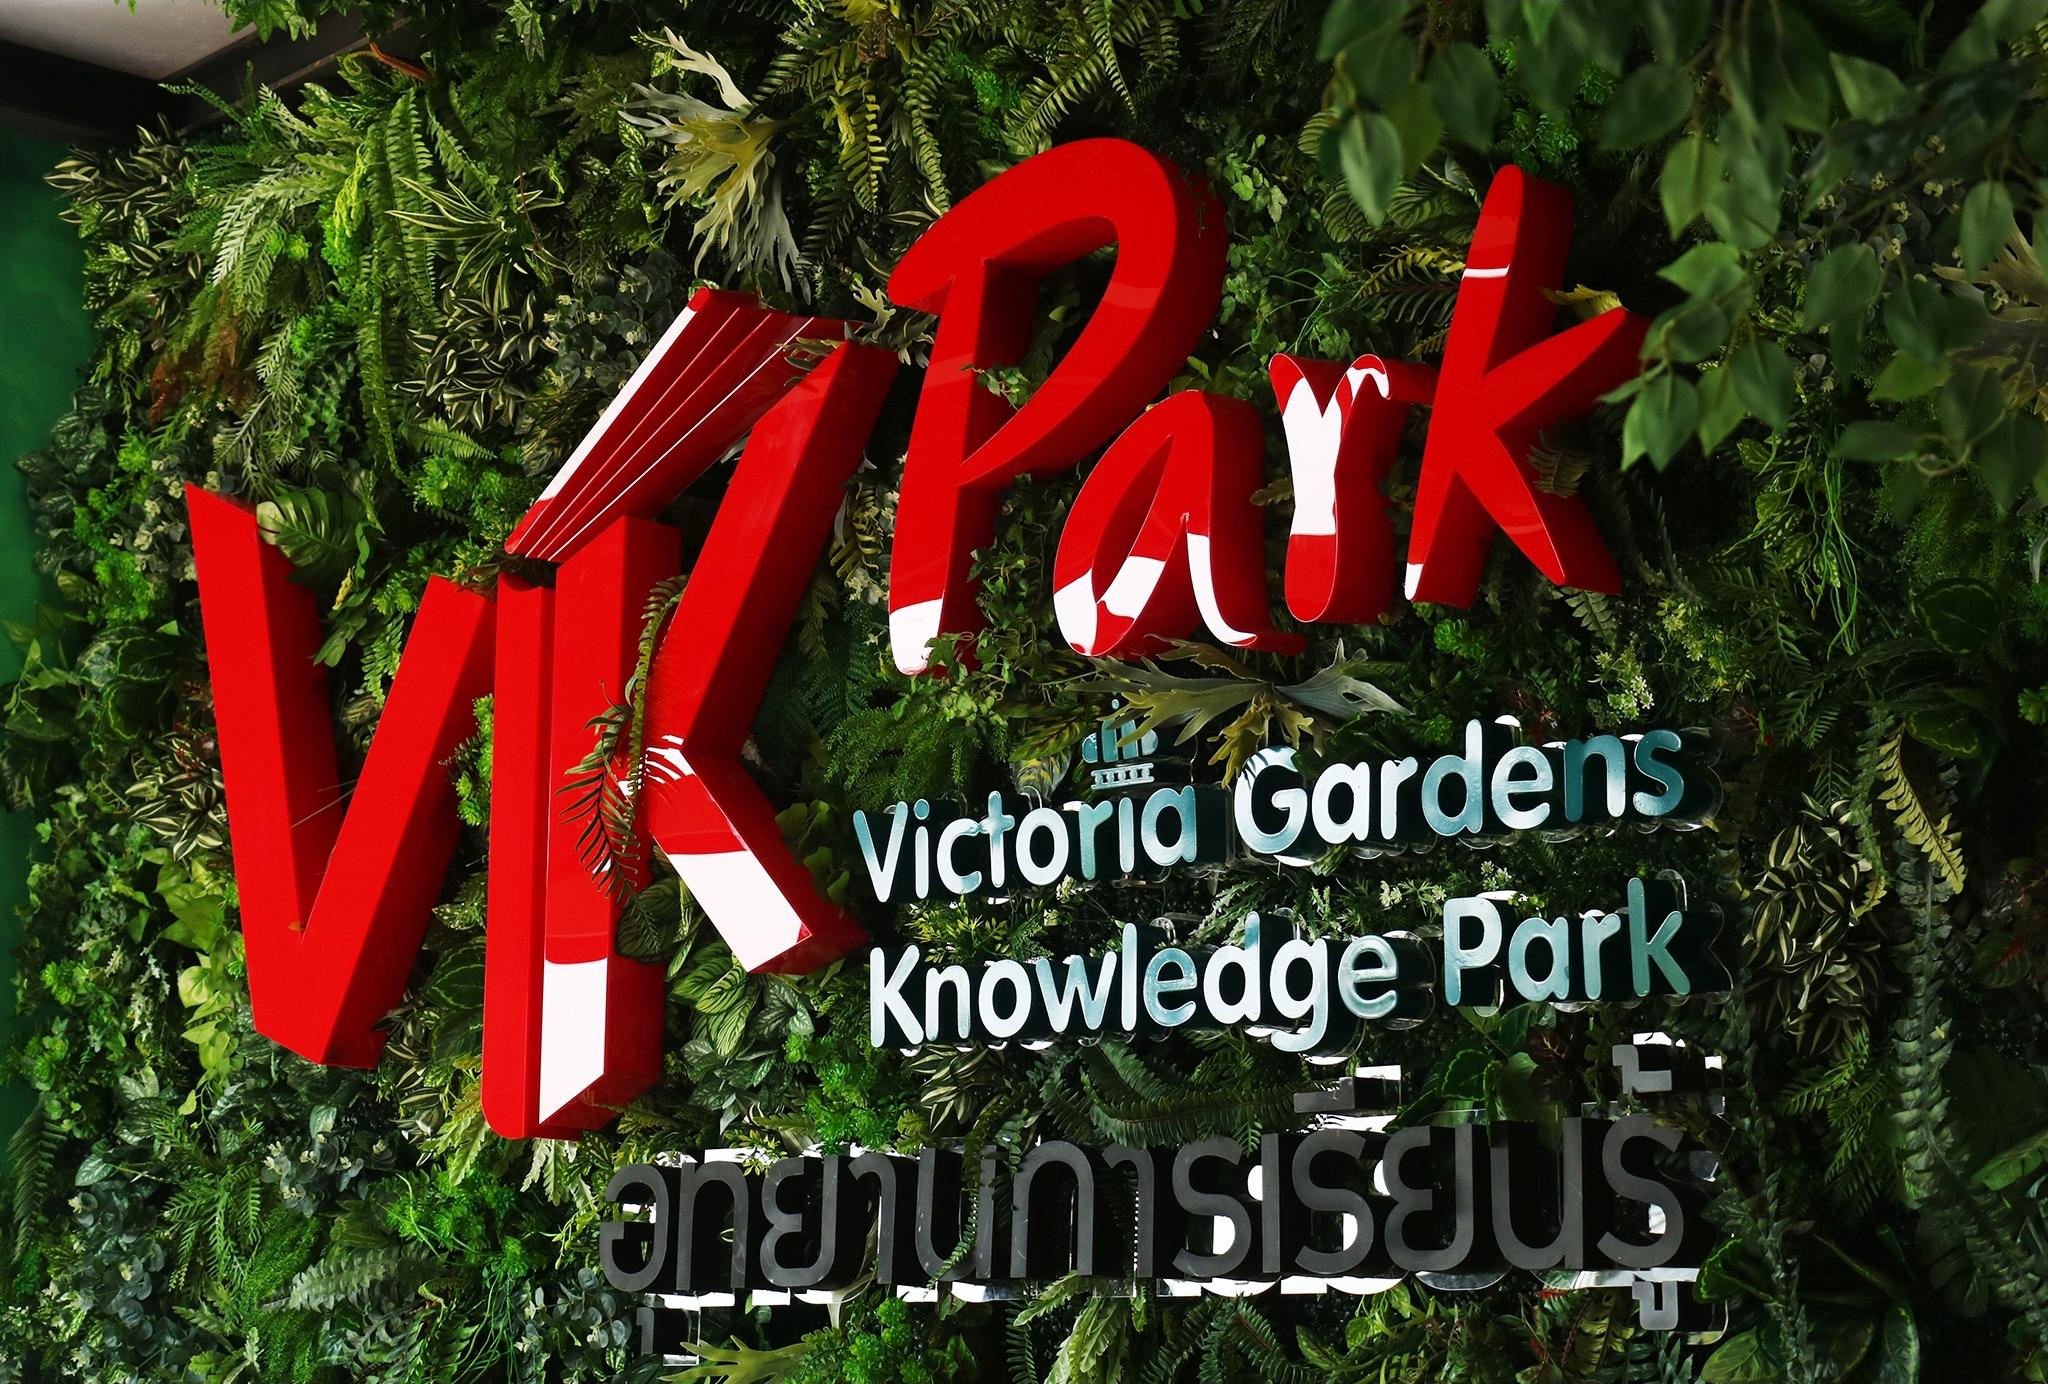 VK park ล่าสุด_๑๘๐๔๒๗_0003.jpg